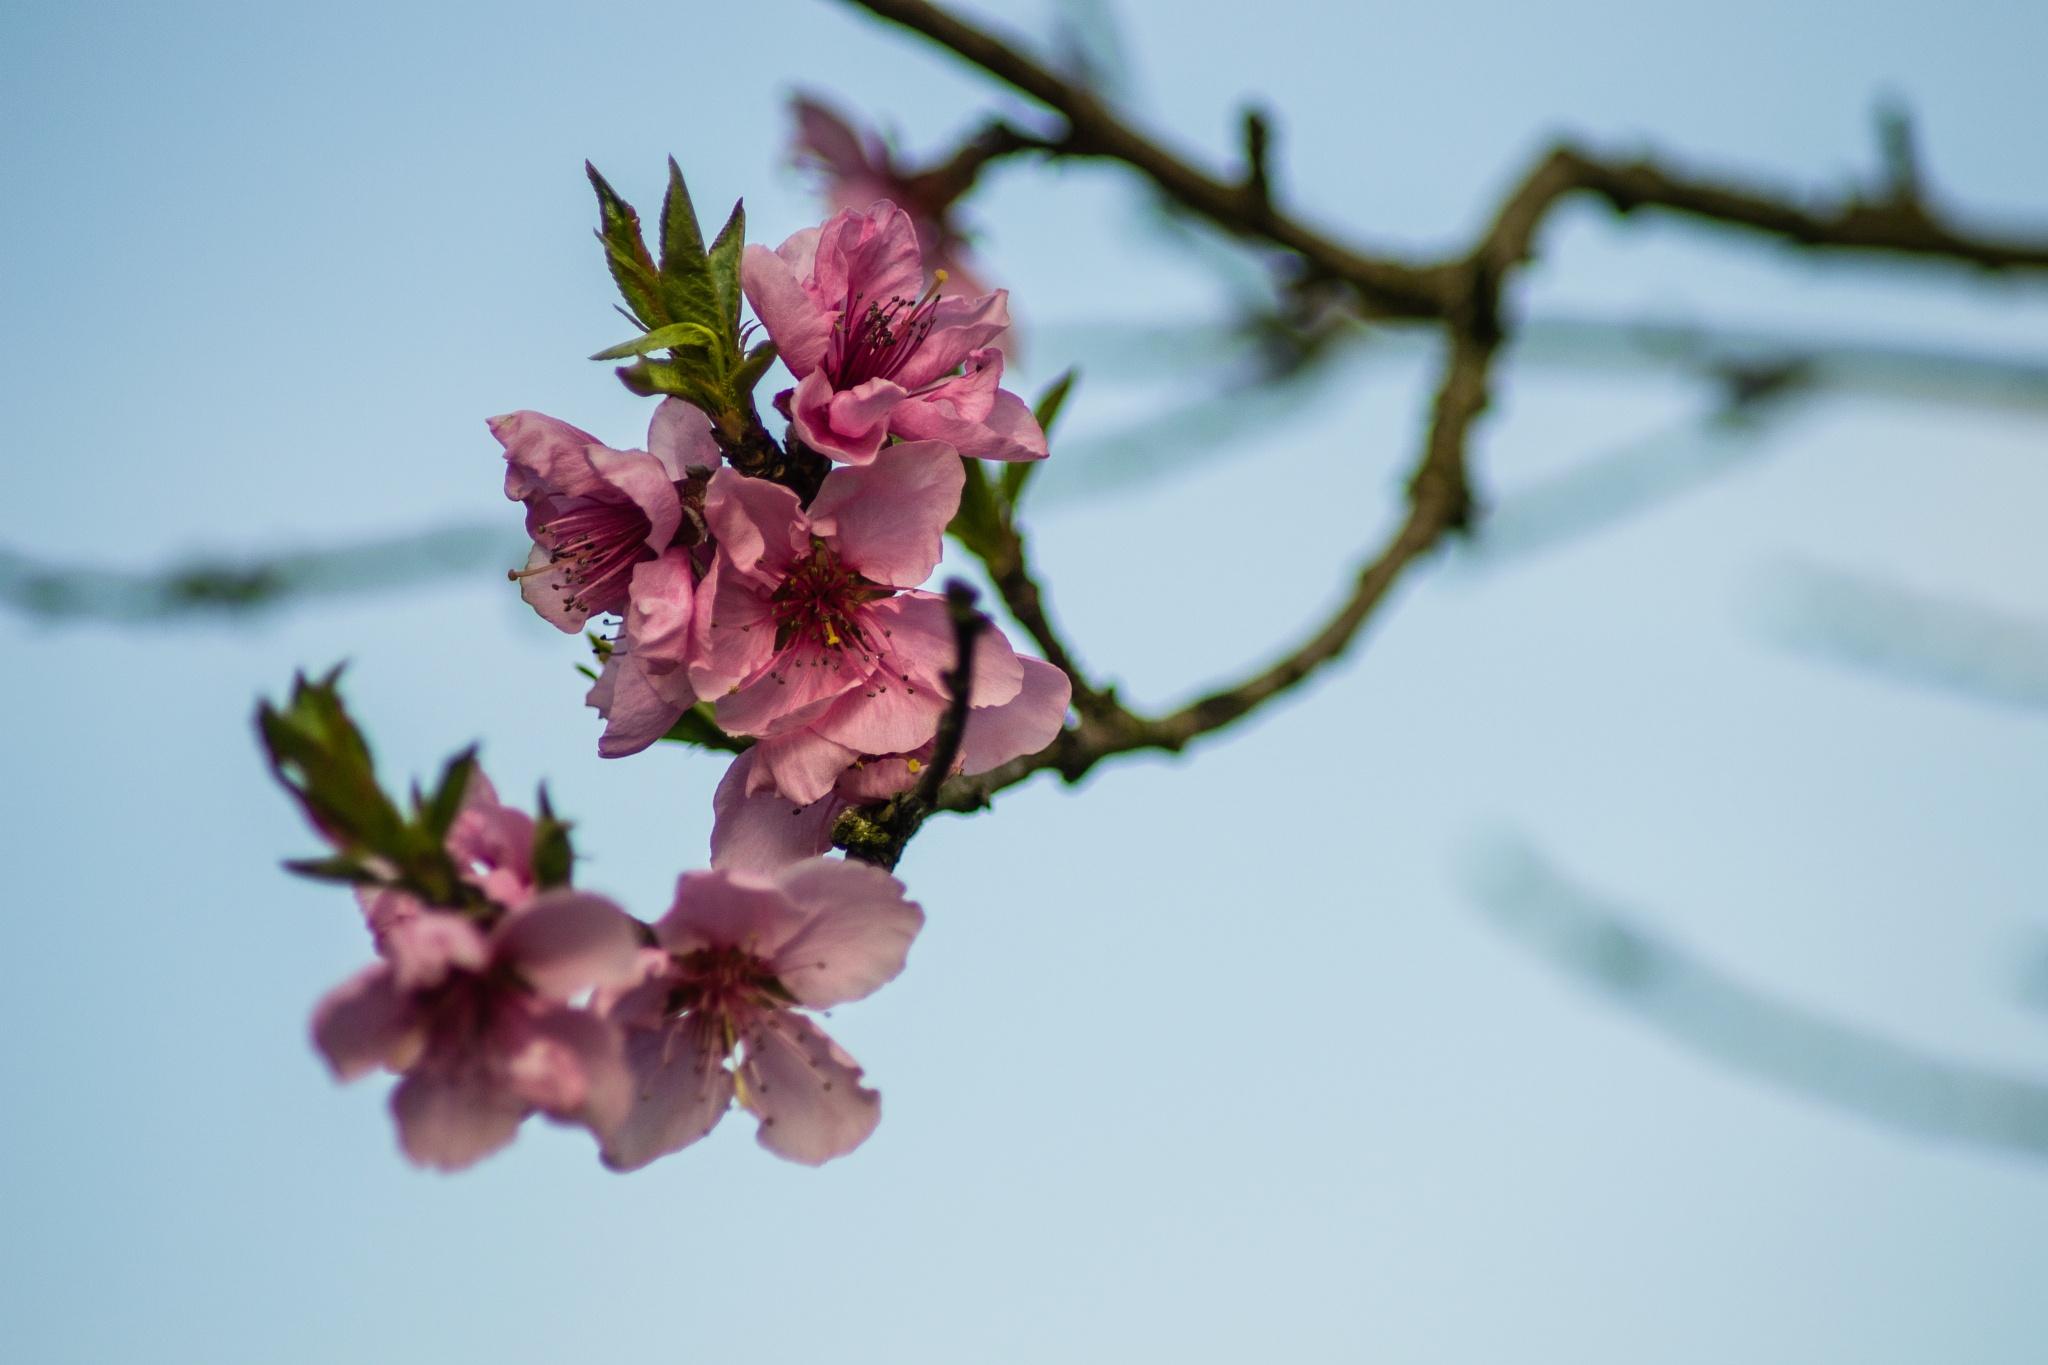 Flowers by kerber